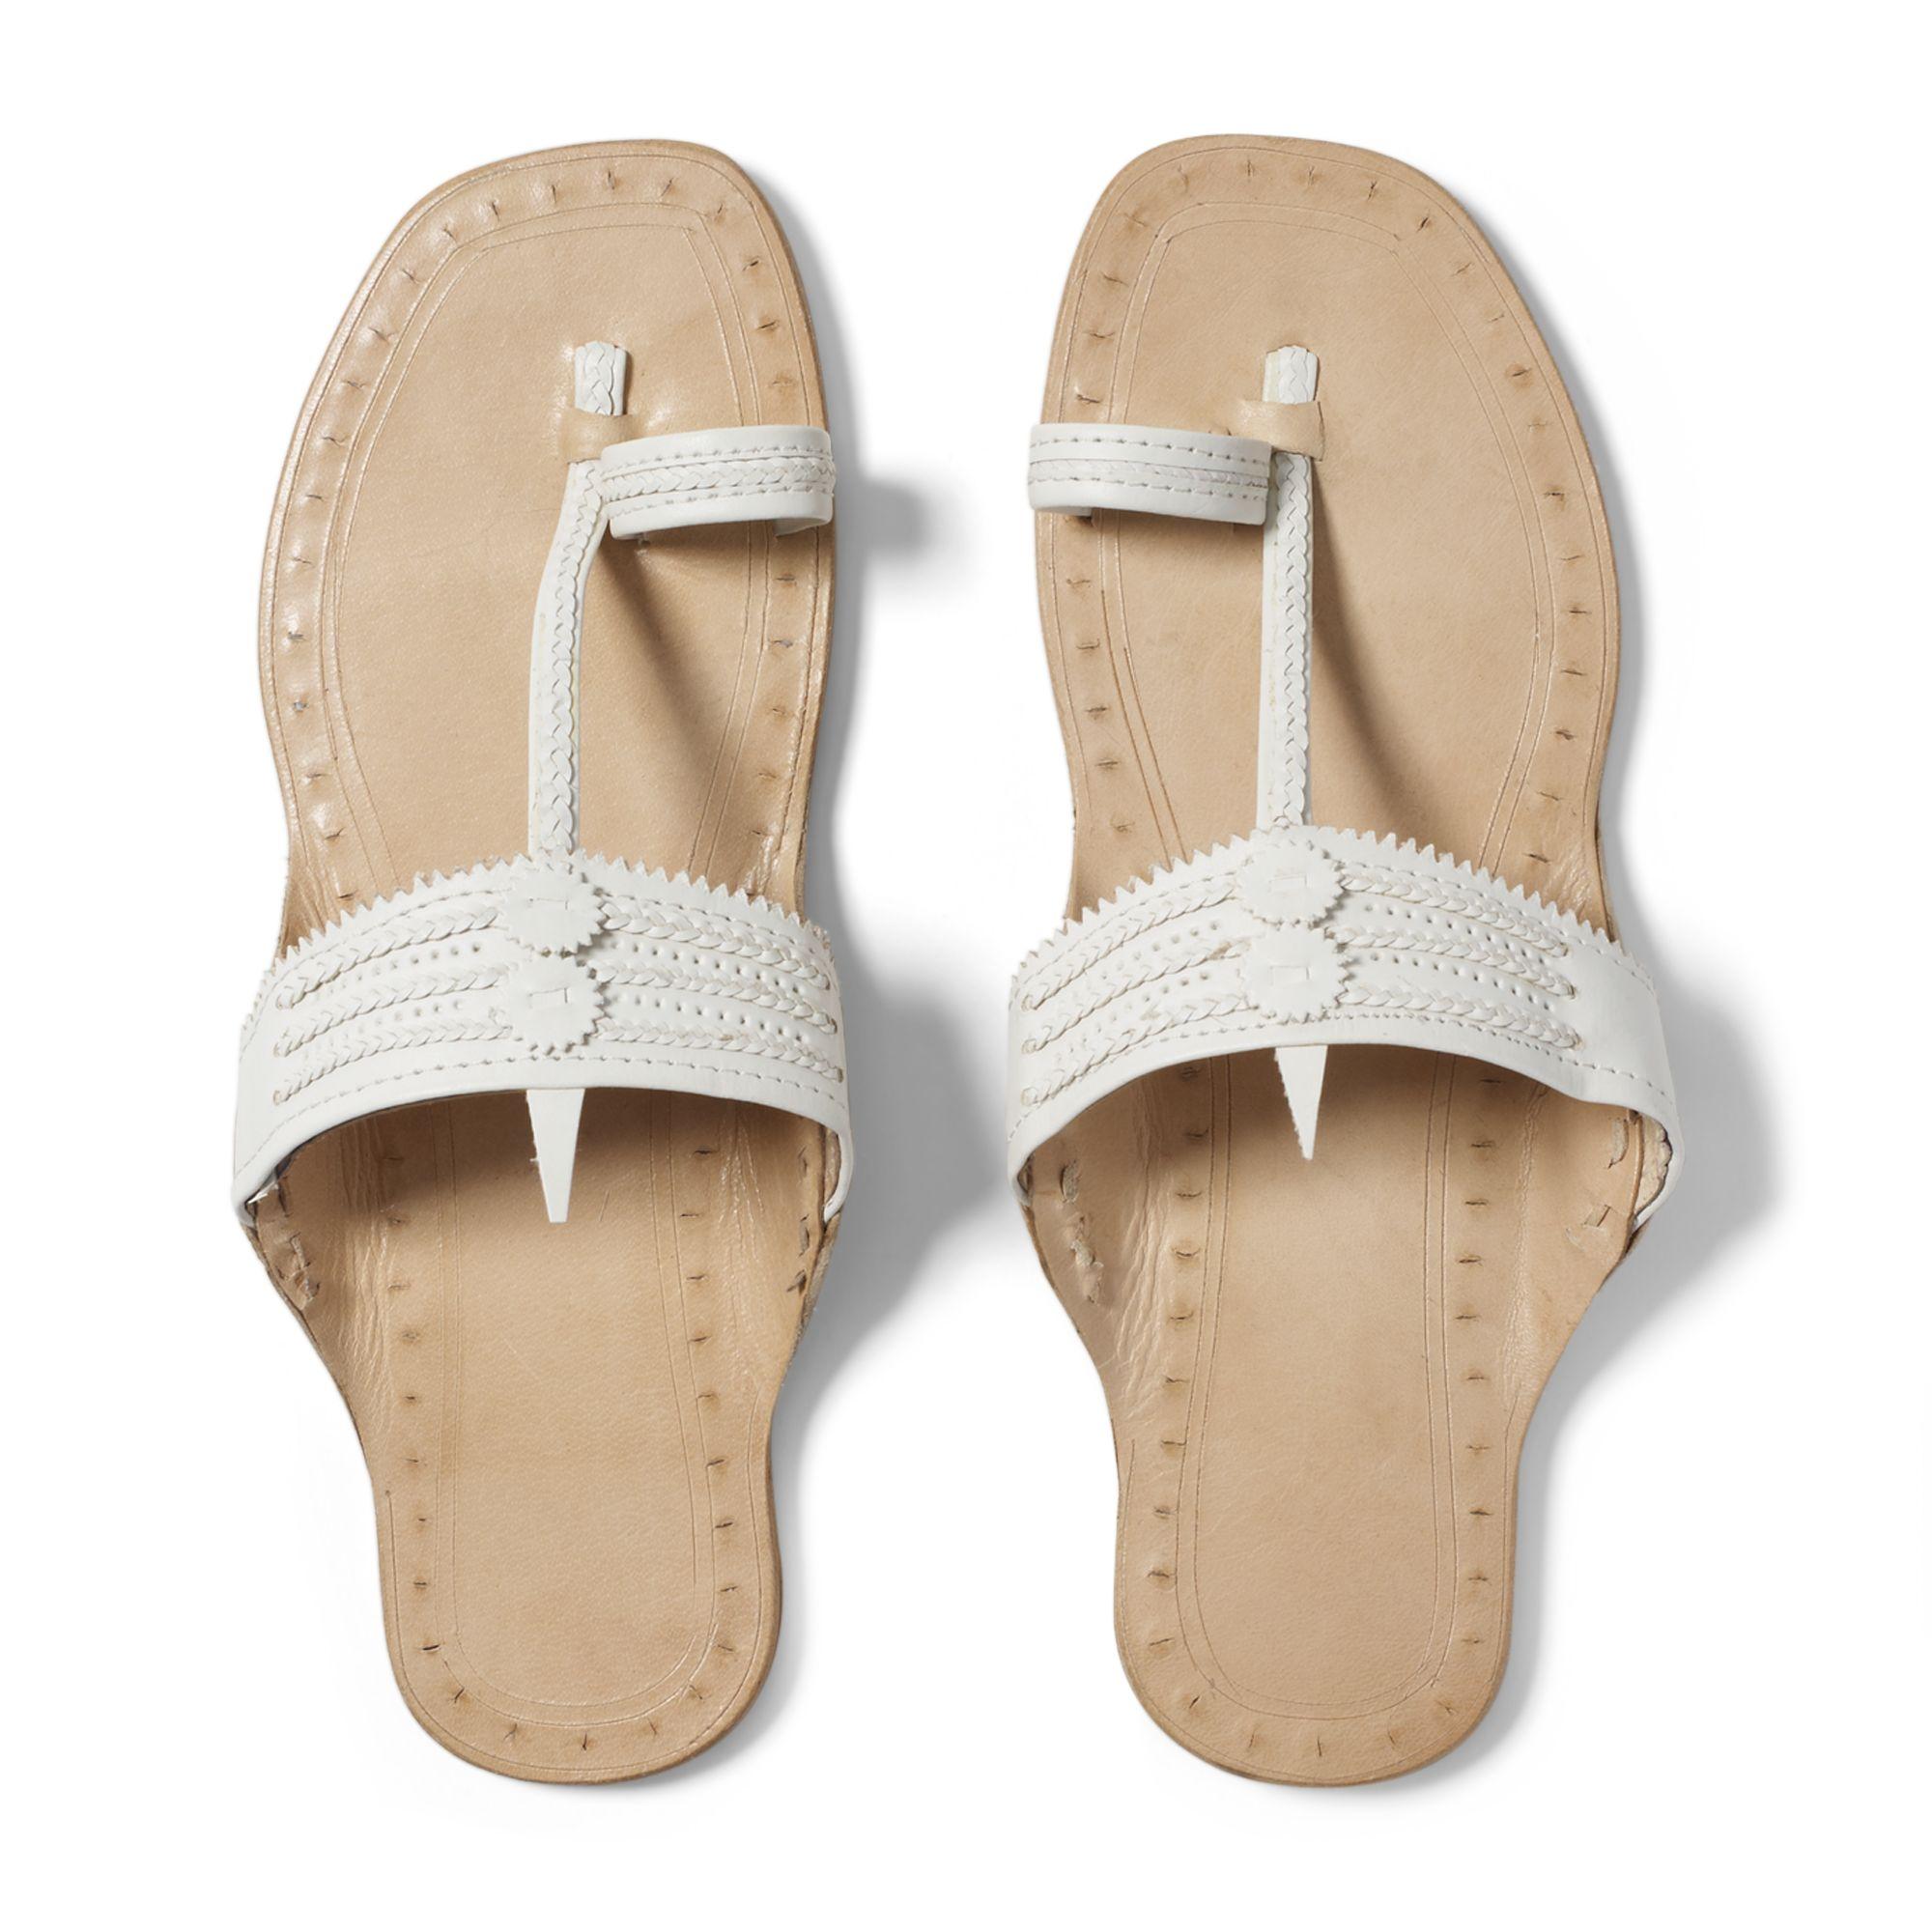 2858d8381d62 Lyst - Club Monaco Indian Sandals in White